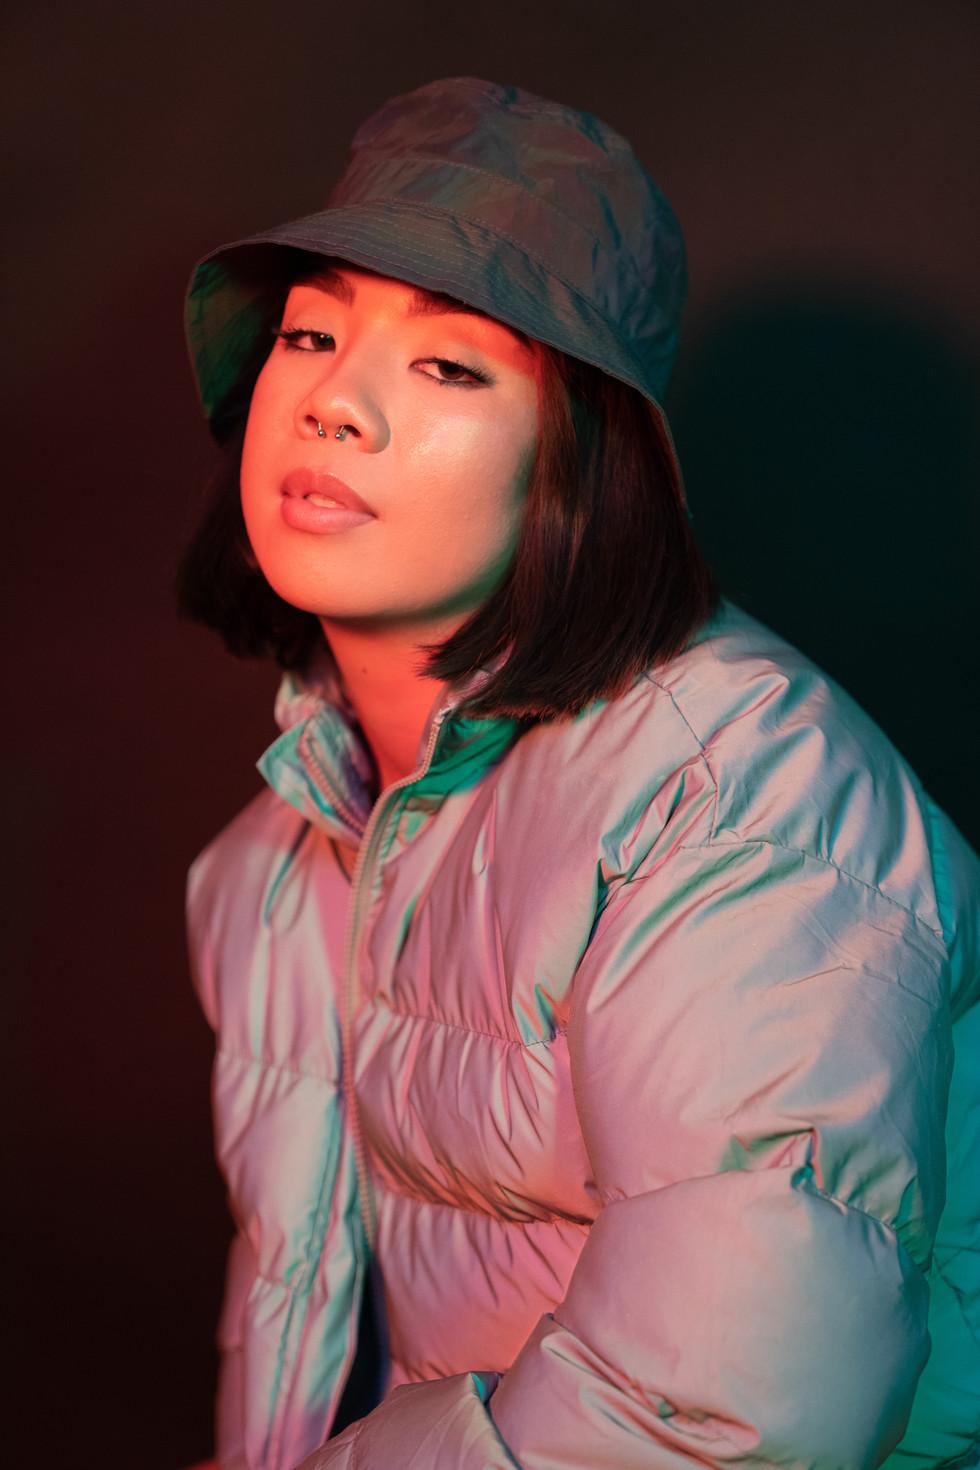 Girl With Bucket Hat + Red Light | Portrait/Fashion Photography | Chromatone Studios